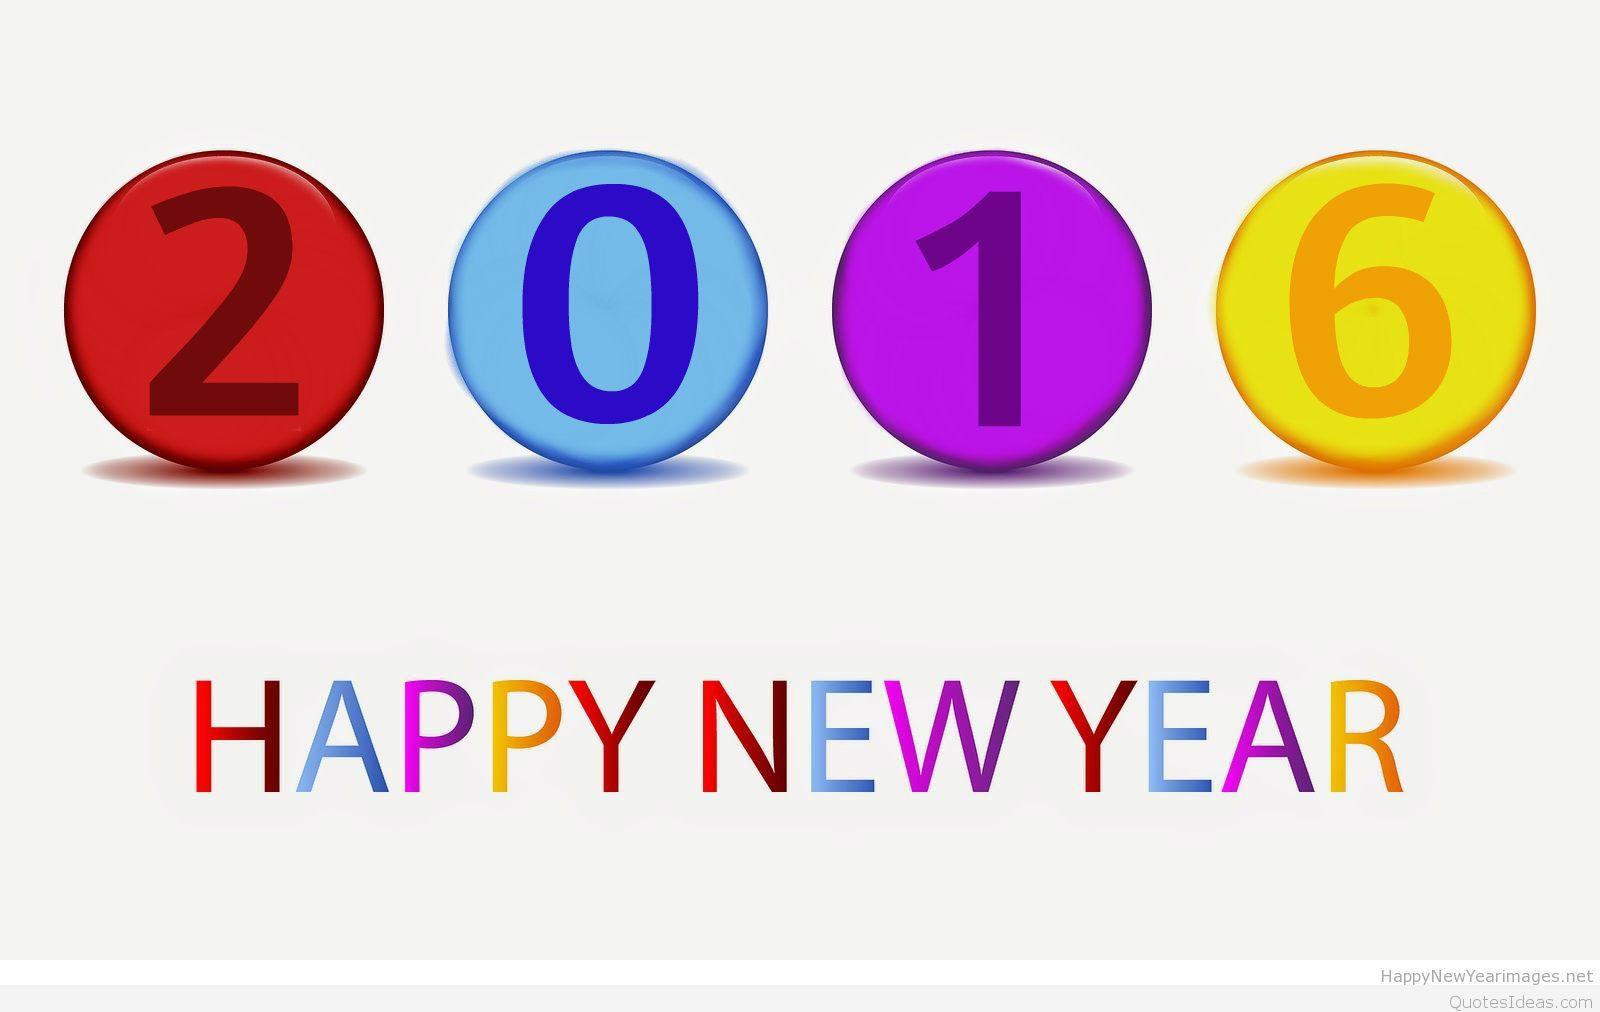 1600x1012 Happy New Year Free Clipart Many Interesting Cliparts